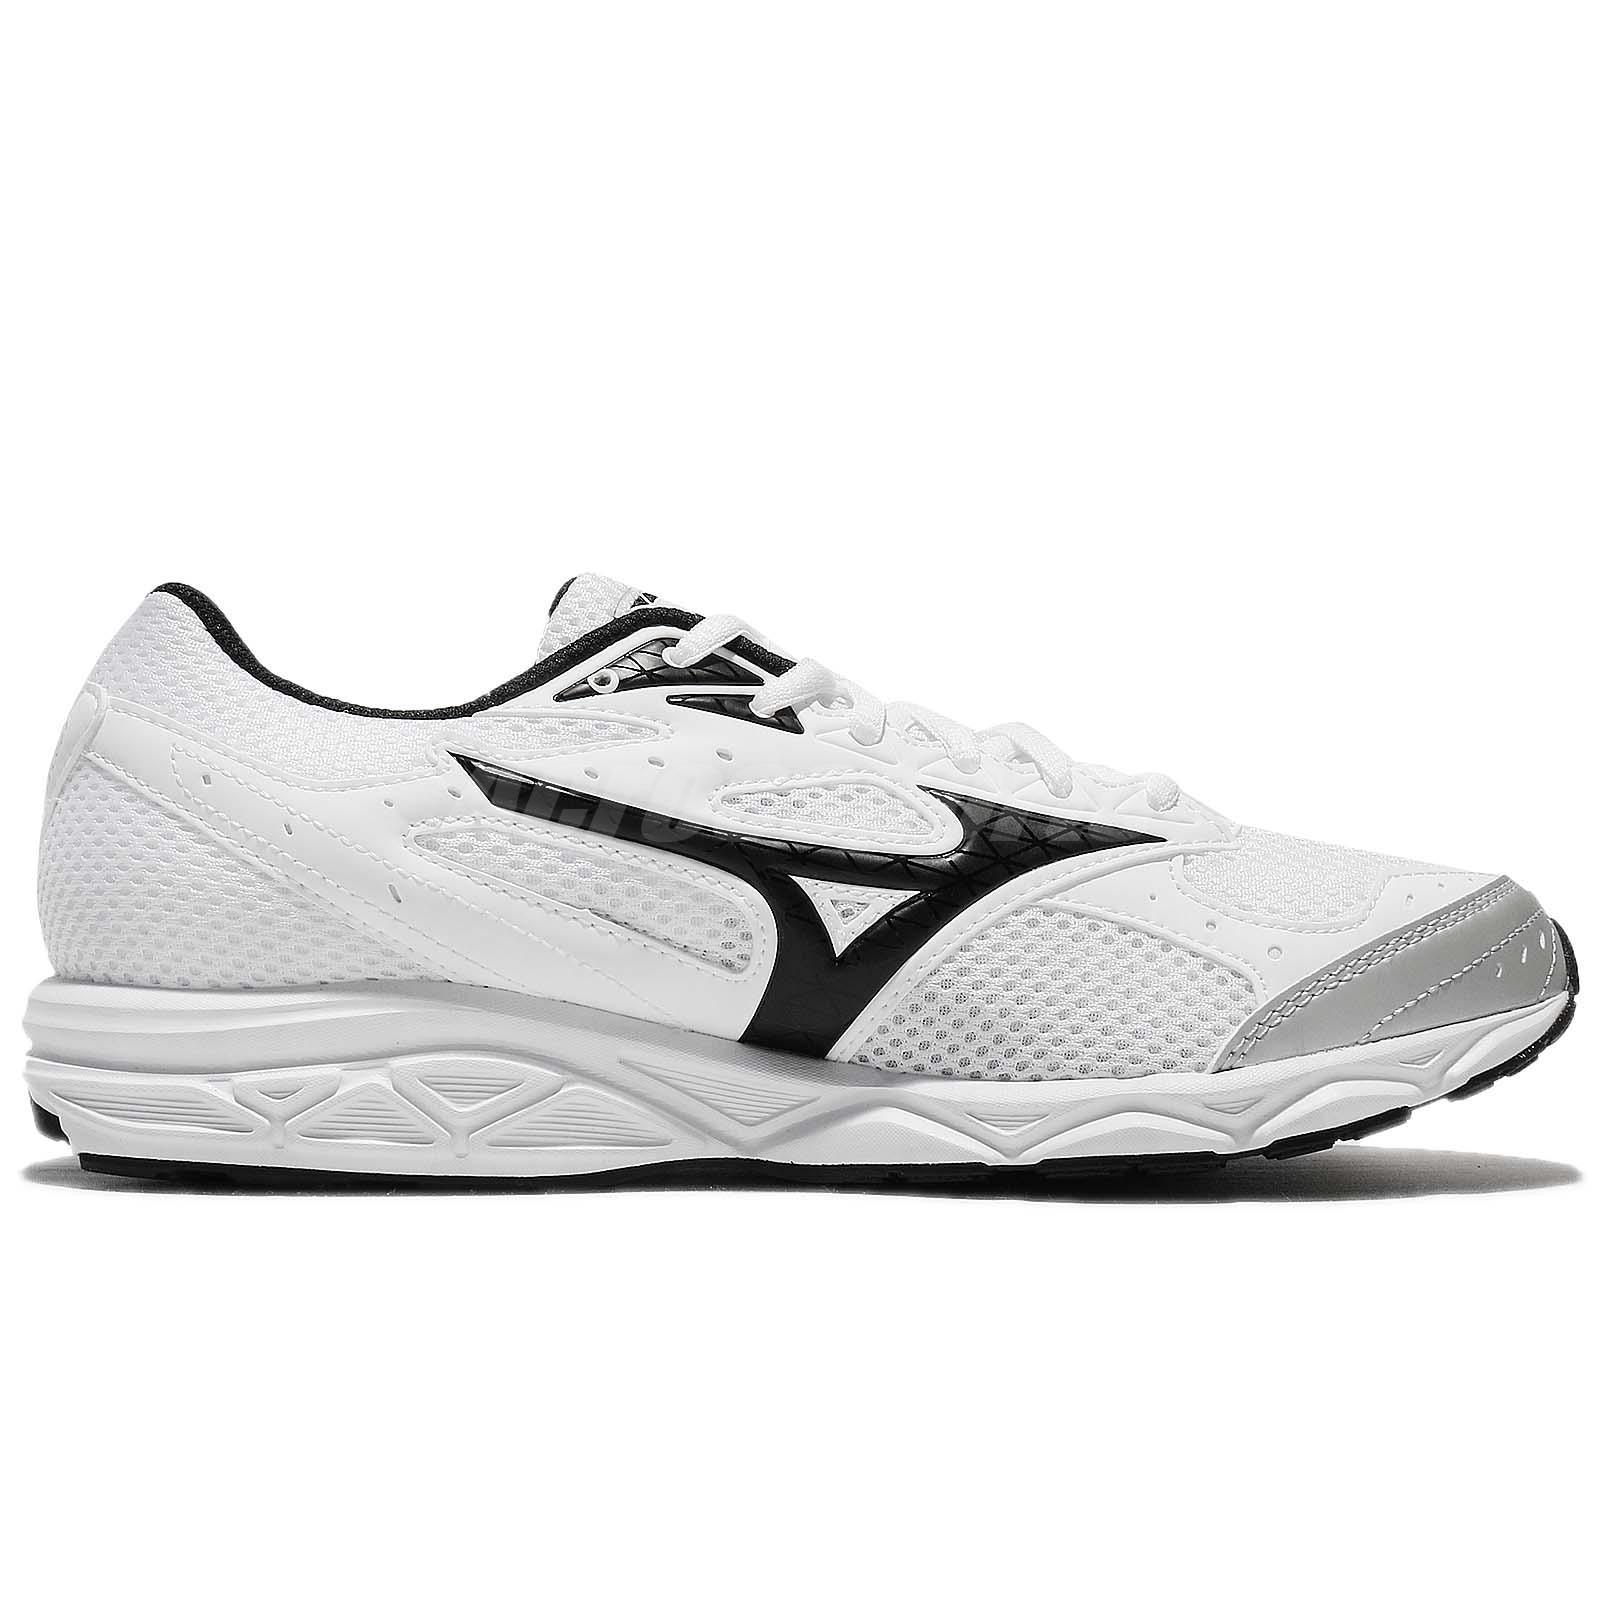 Mizuno Running shoes MAXIMIZER 20 K1GA1800 Black × White × Green Free shipping